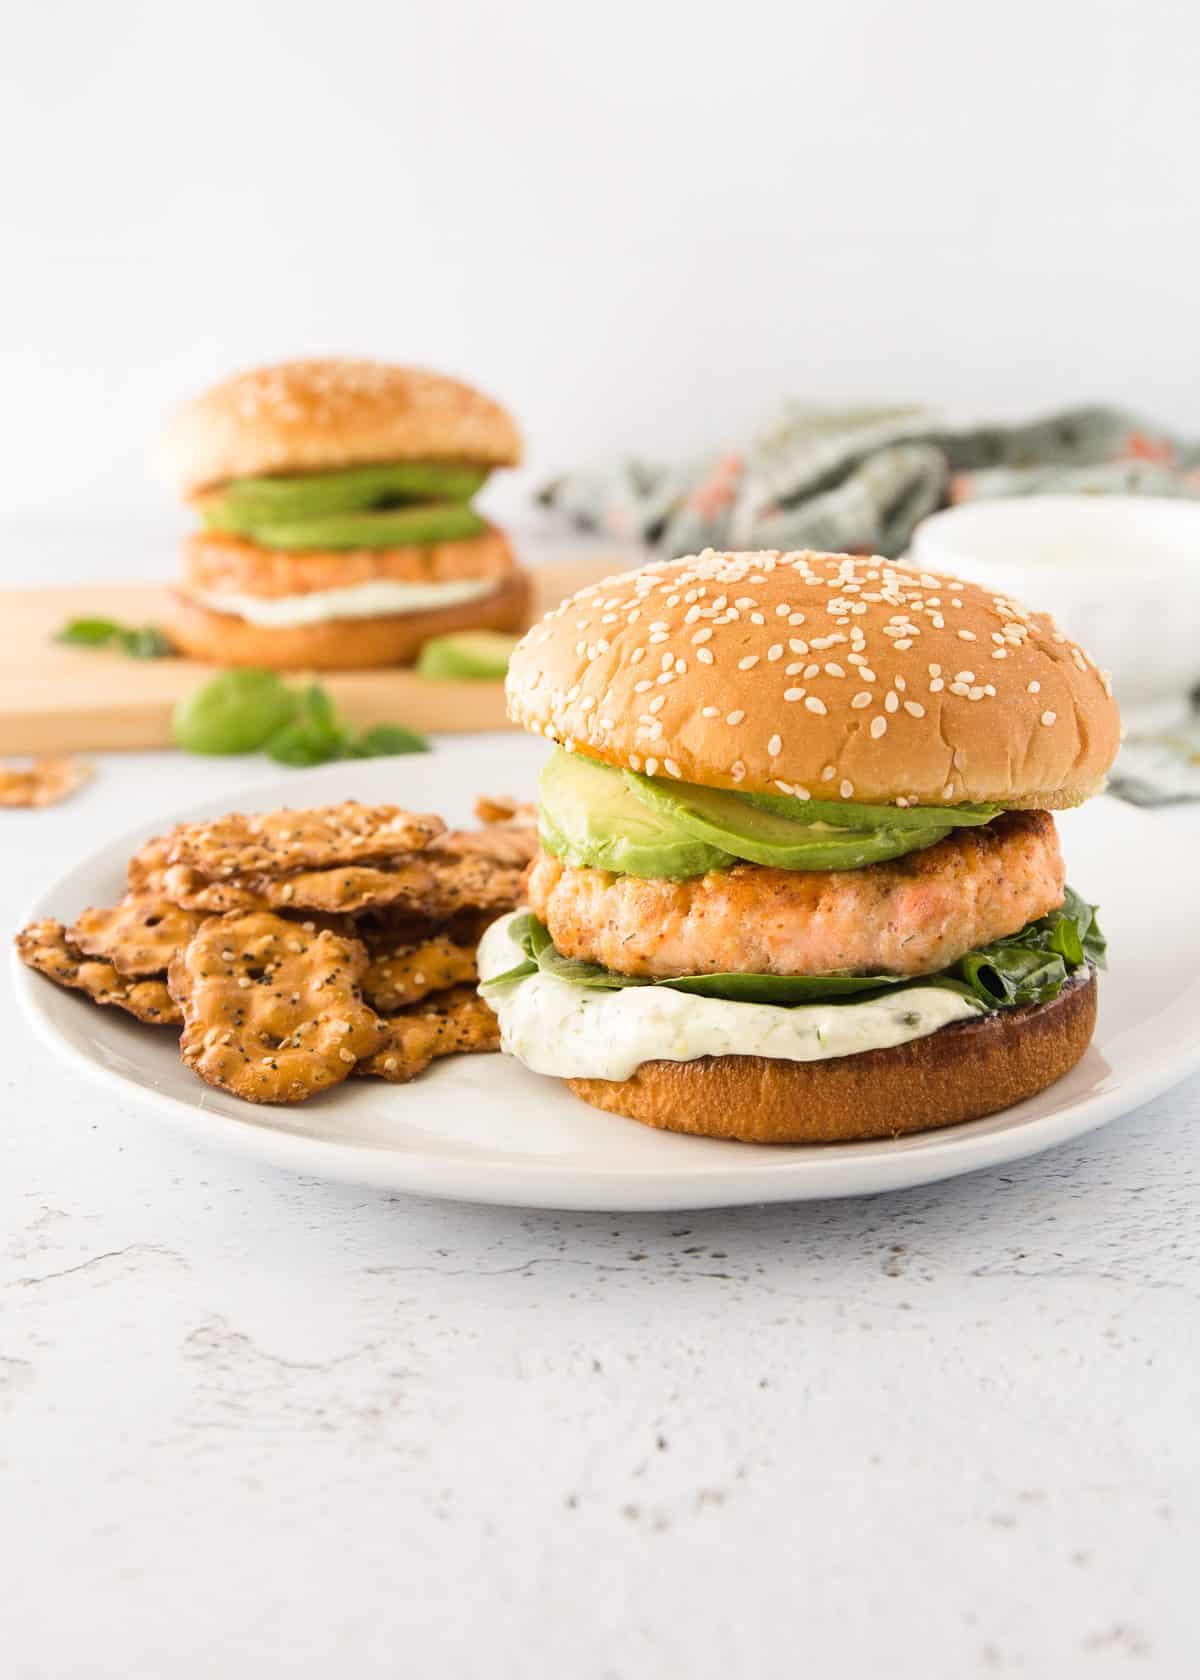 a salmon burger on a bun on a white plate